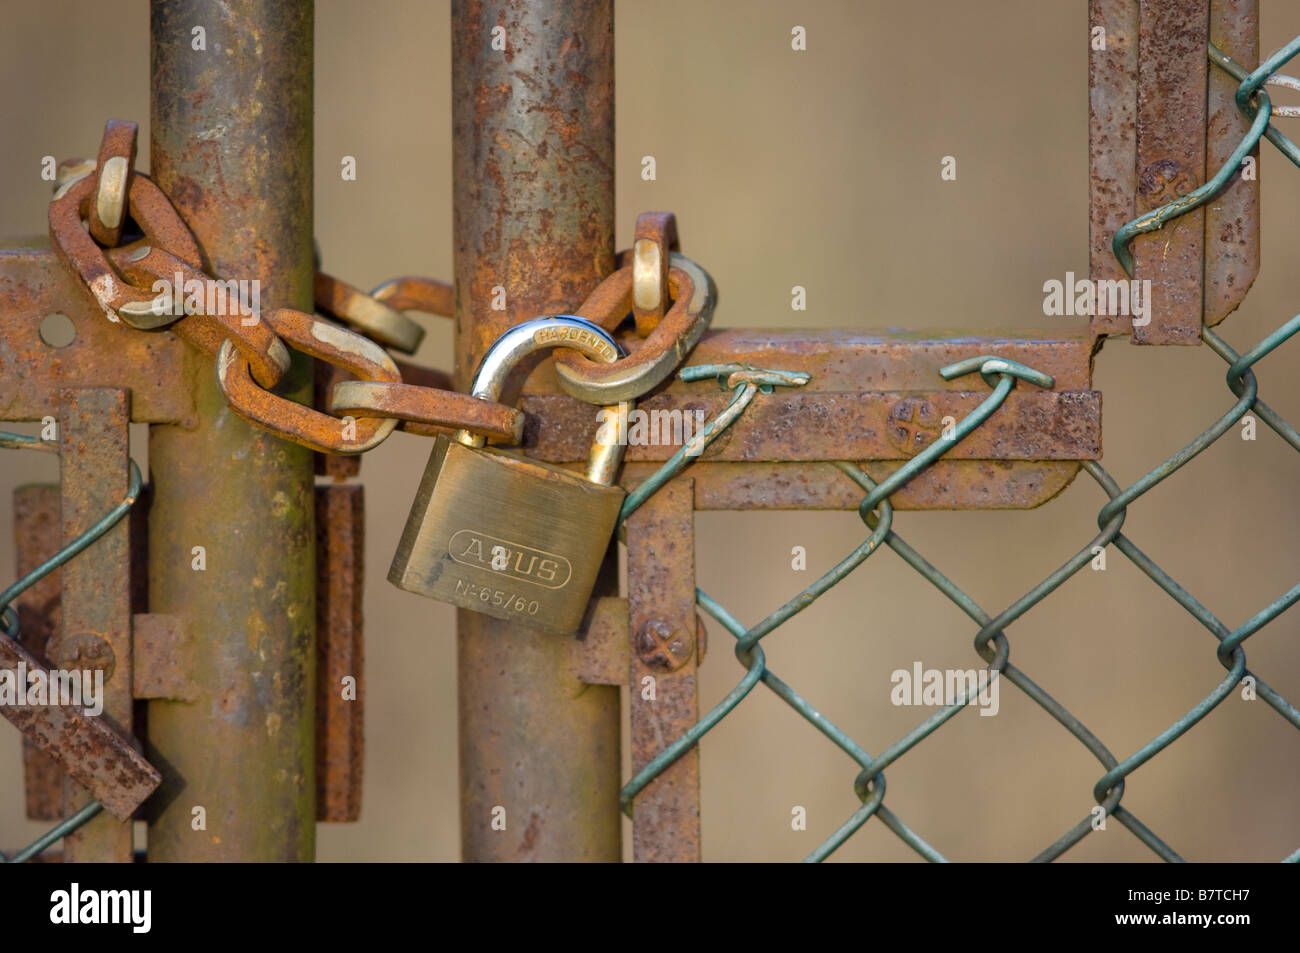 Coal Chain Stock Photos & Coal Chain Stock Images - Alamy